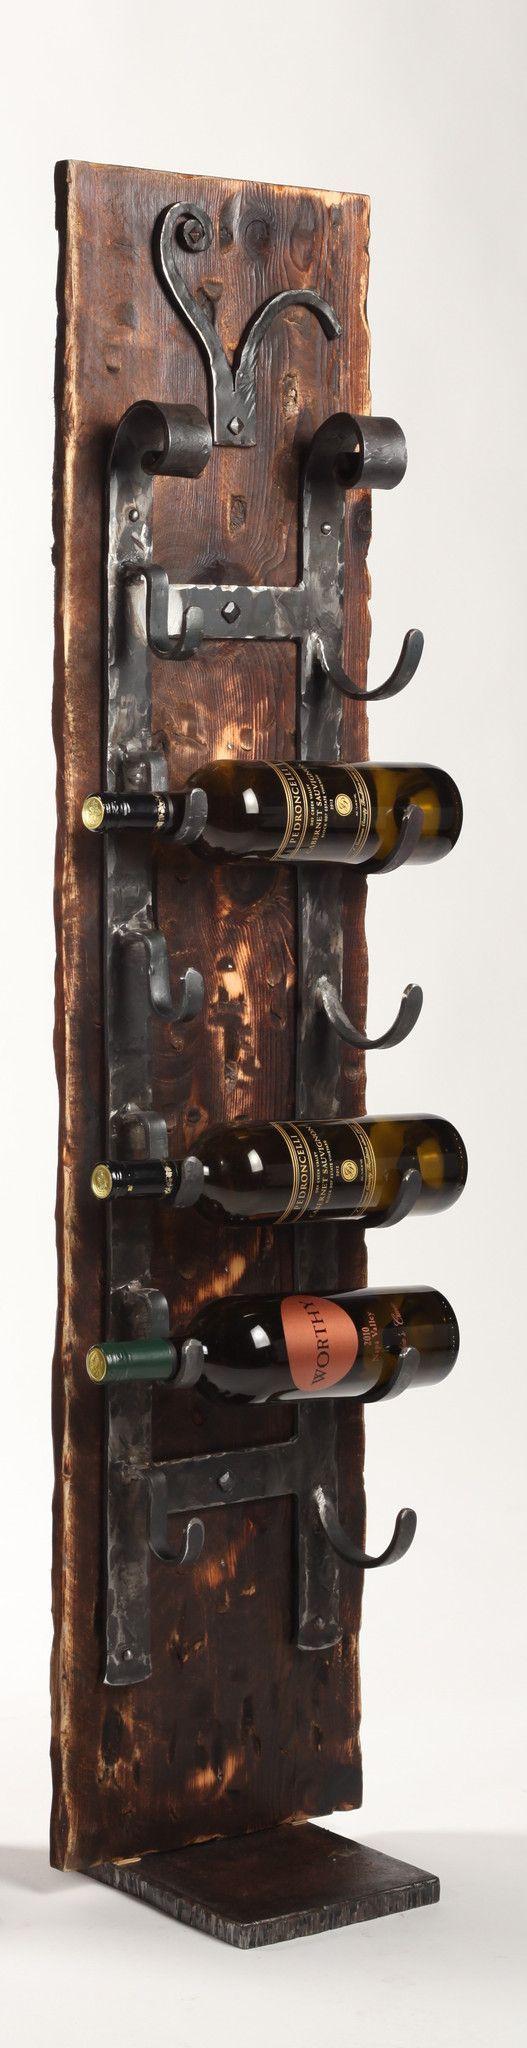 Floor standing 39 old world 39 wine racks 4 39 artesanias - Botelleros de obra ...